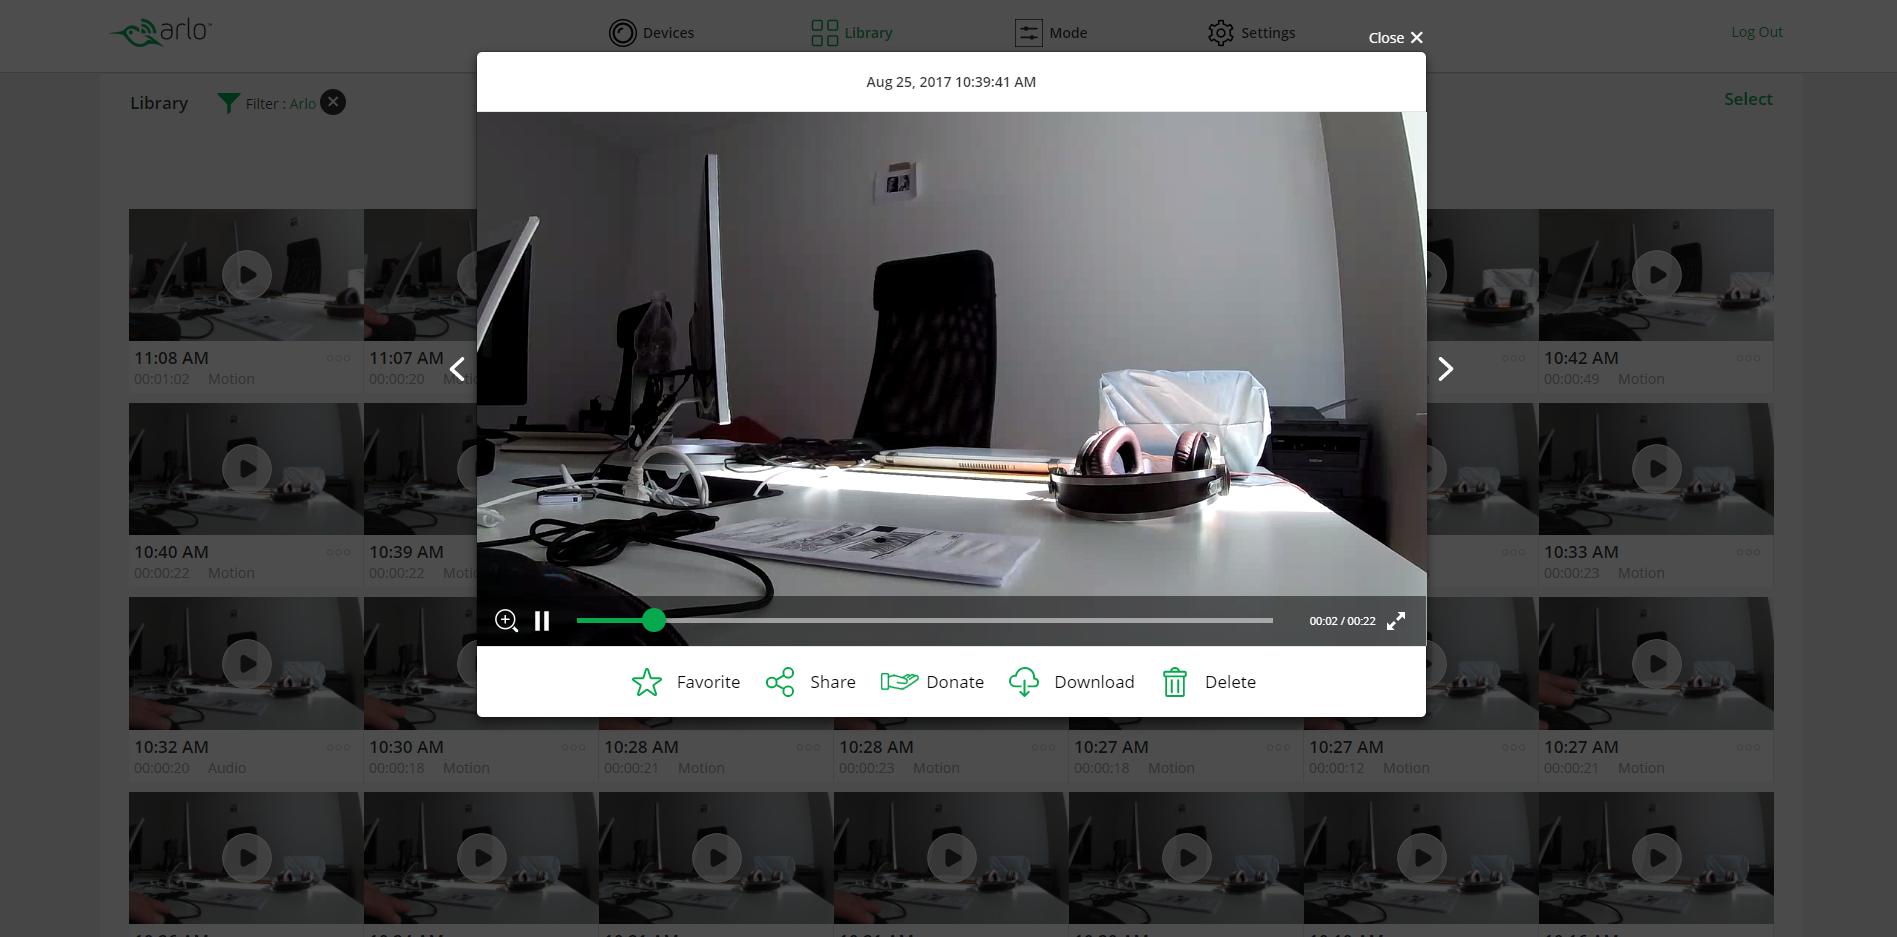 podgląd nagranego obrazu zkamery Netgear Arlo Baby